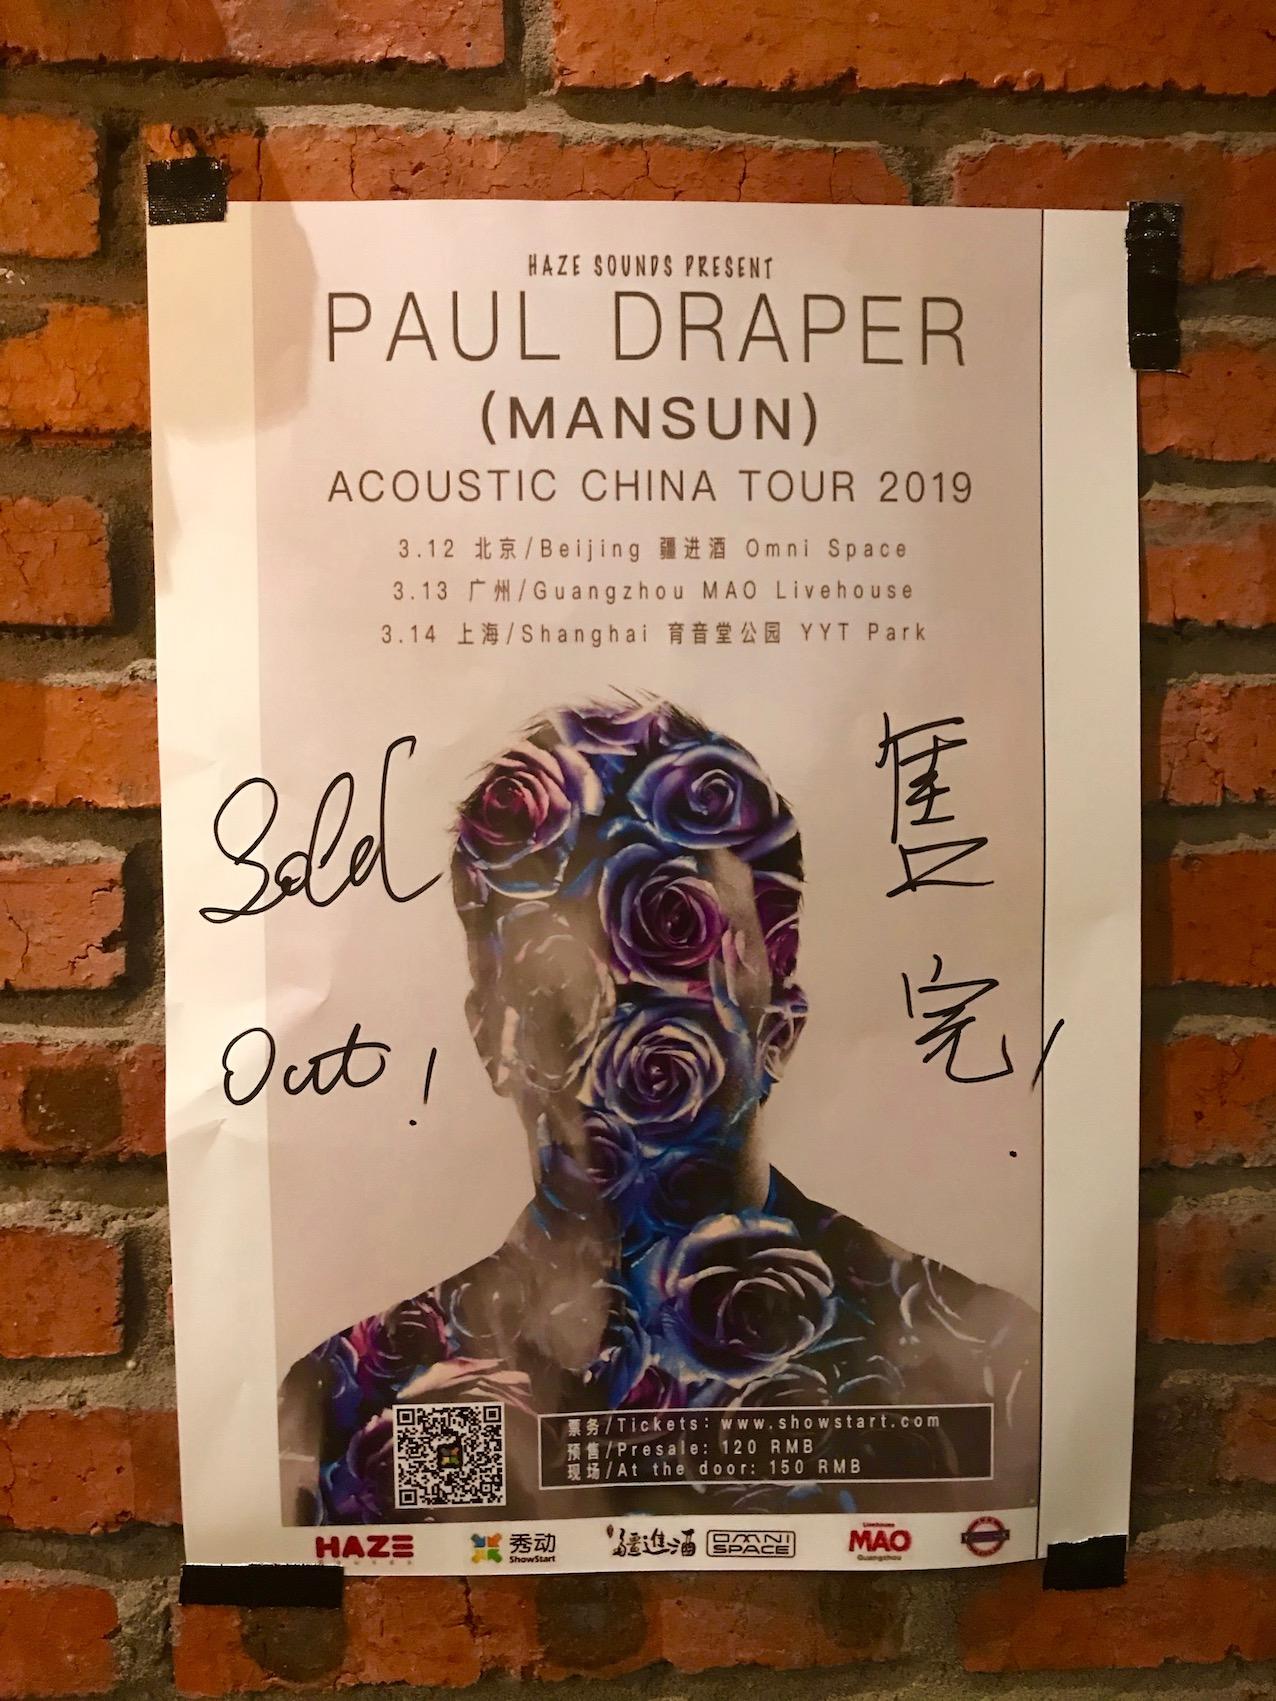 Paul Draper Live at Yuyintang Park Shanghai March 2019